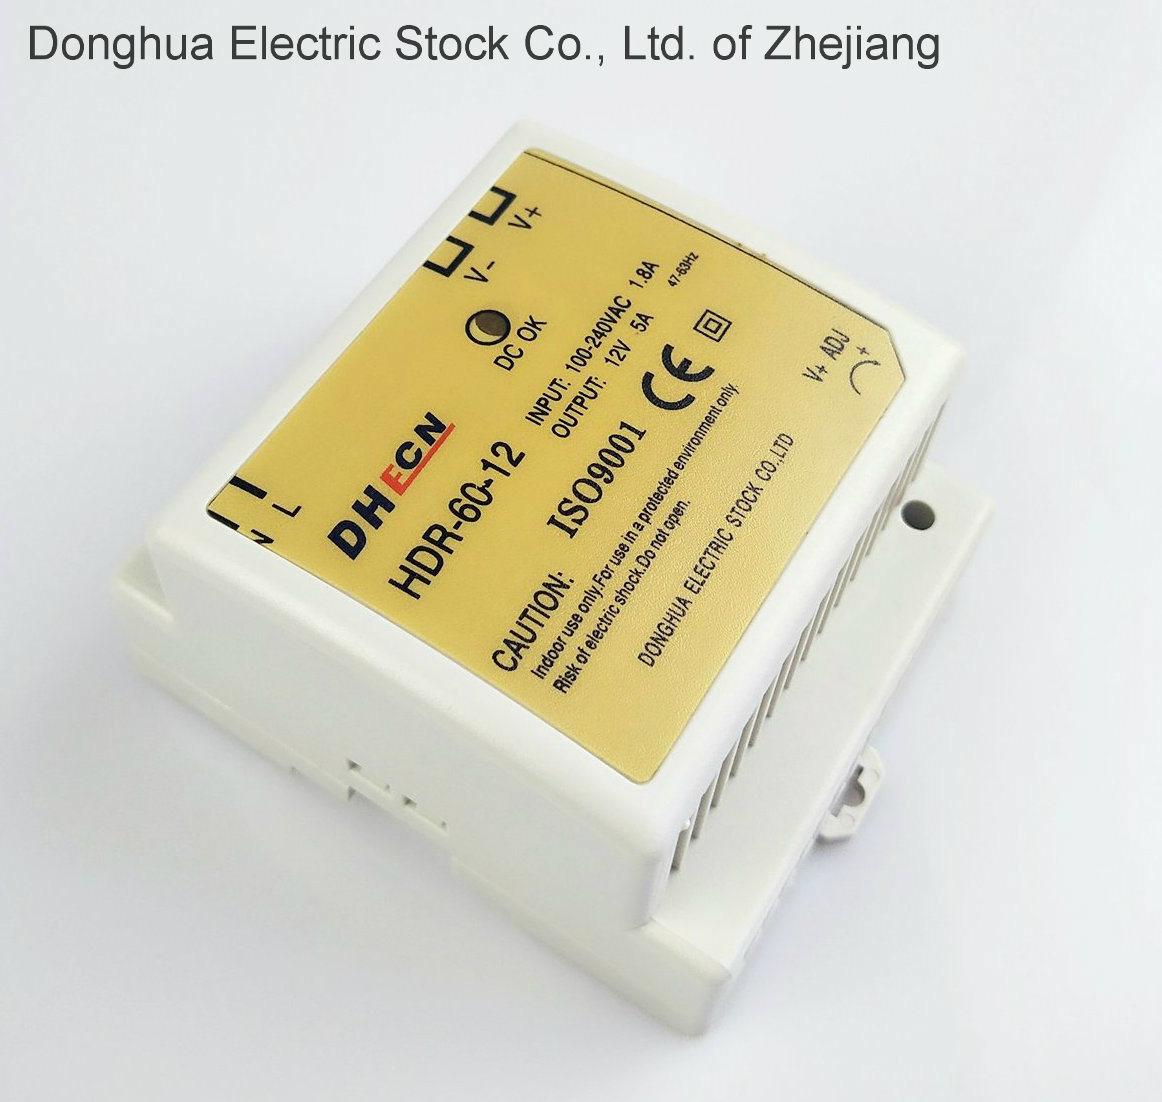 China Din Rail Type Switching Power Supply Universal Ac Input Full 12vdc To 230vac 60w Inverter Circuit Range 88 264 Vac Dc 12v 24v